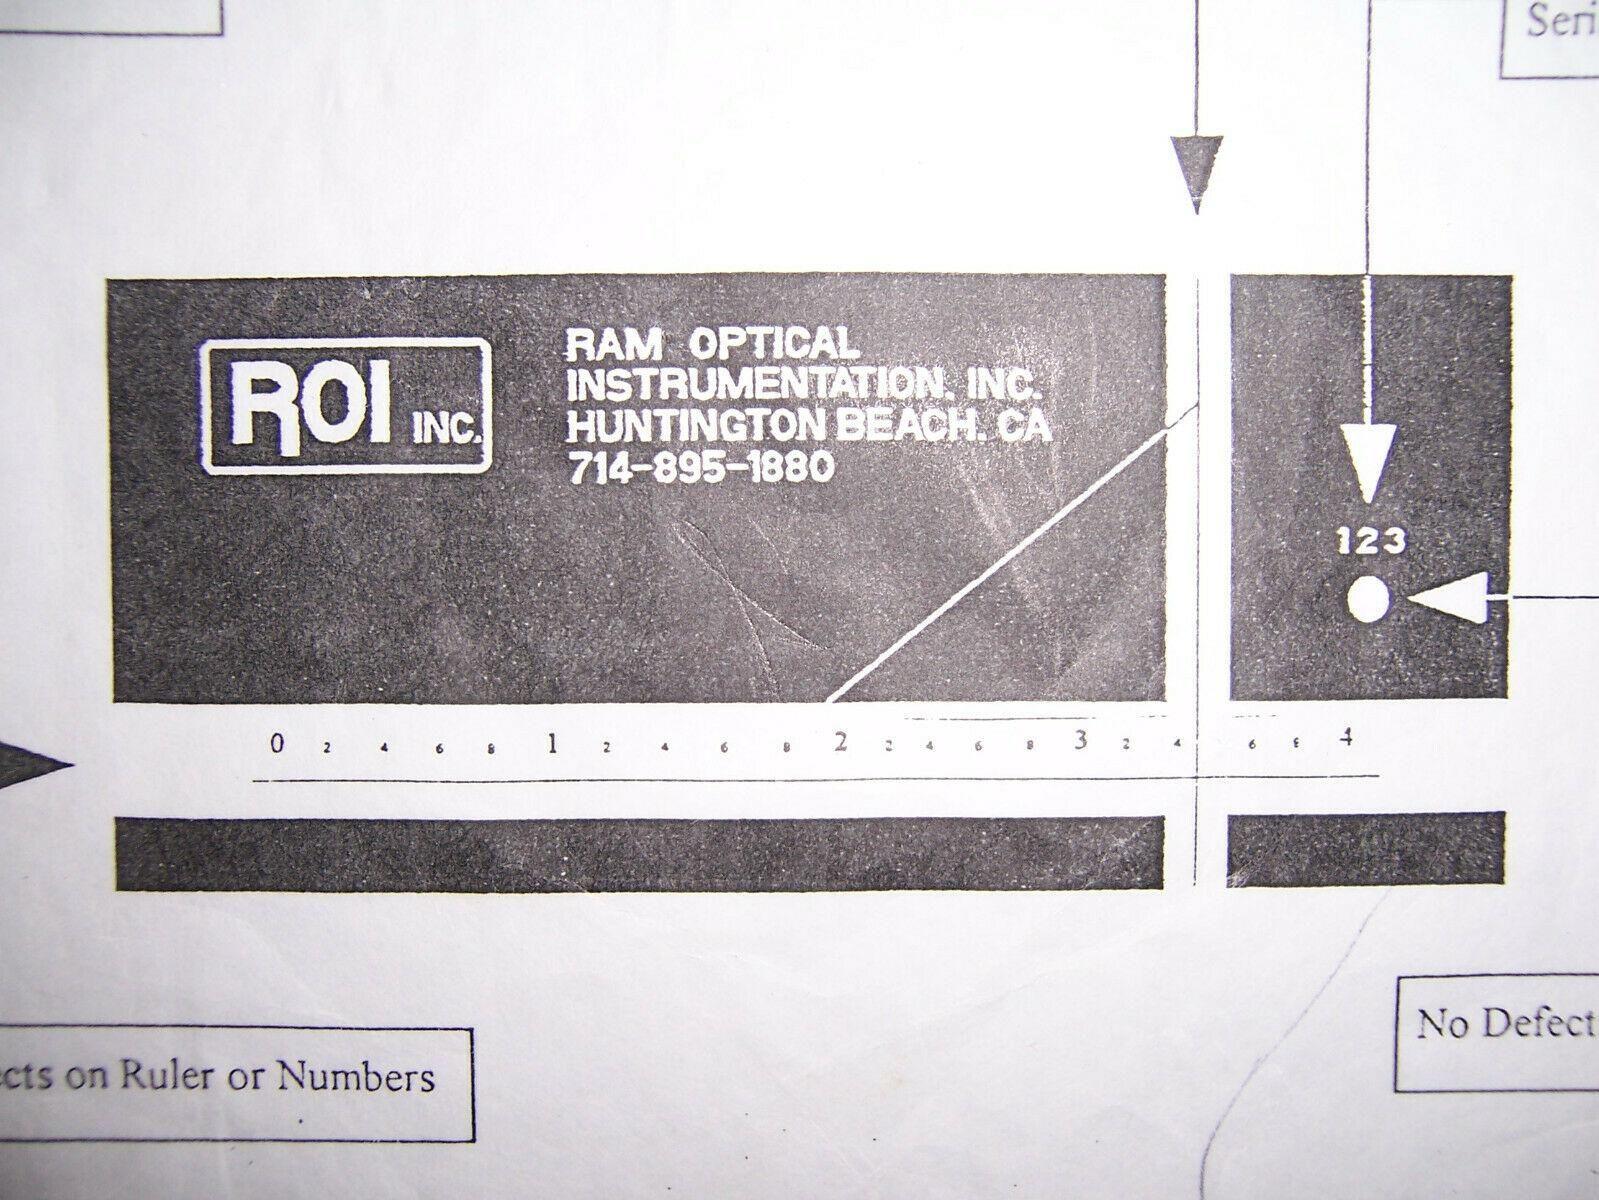 11900 ROI Ram optical standard calibration block for vision system / scope